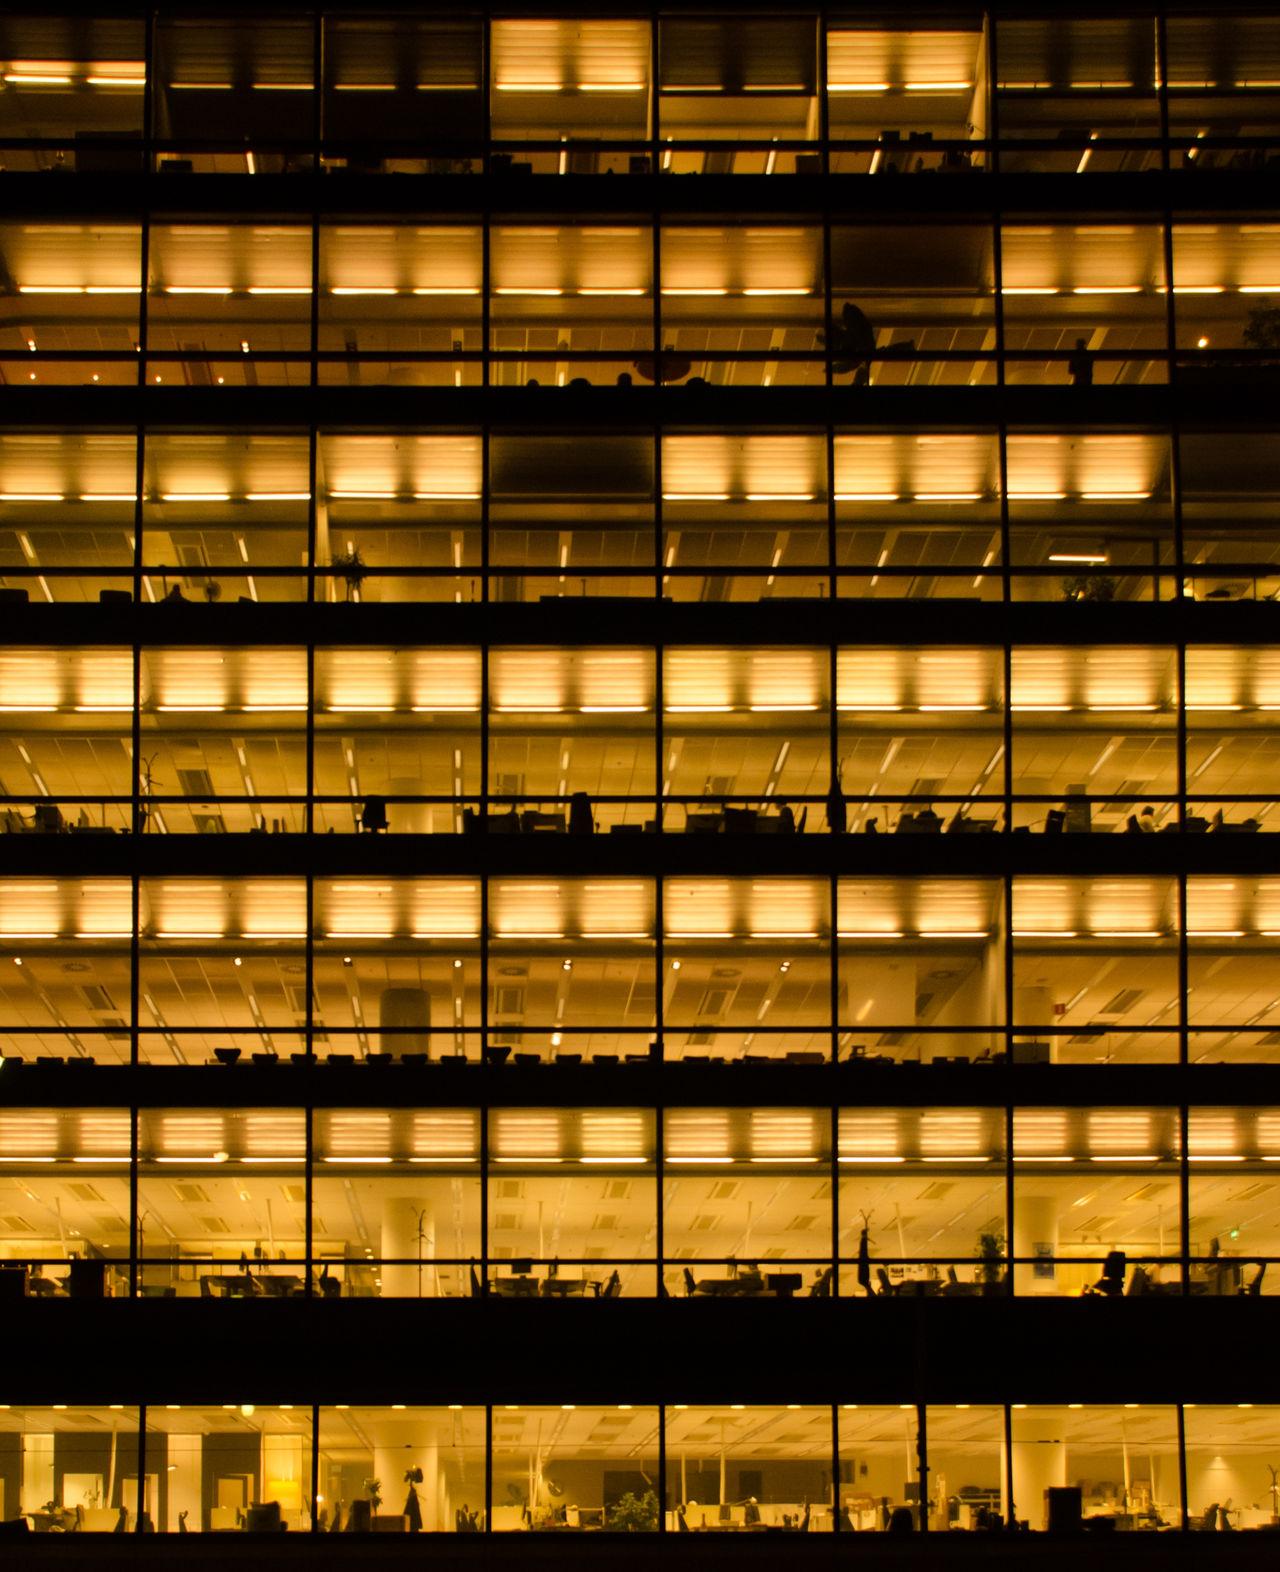 Full frame shot of illuminated office building